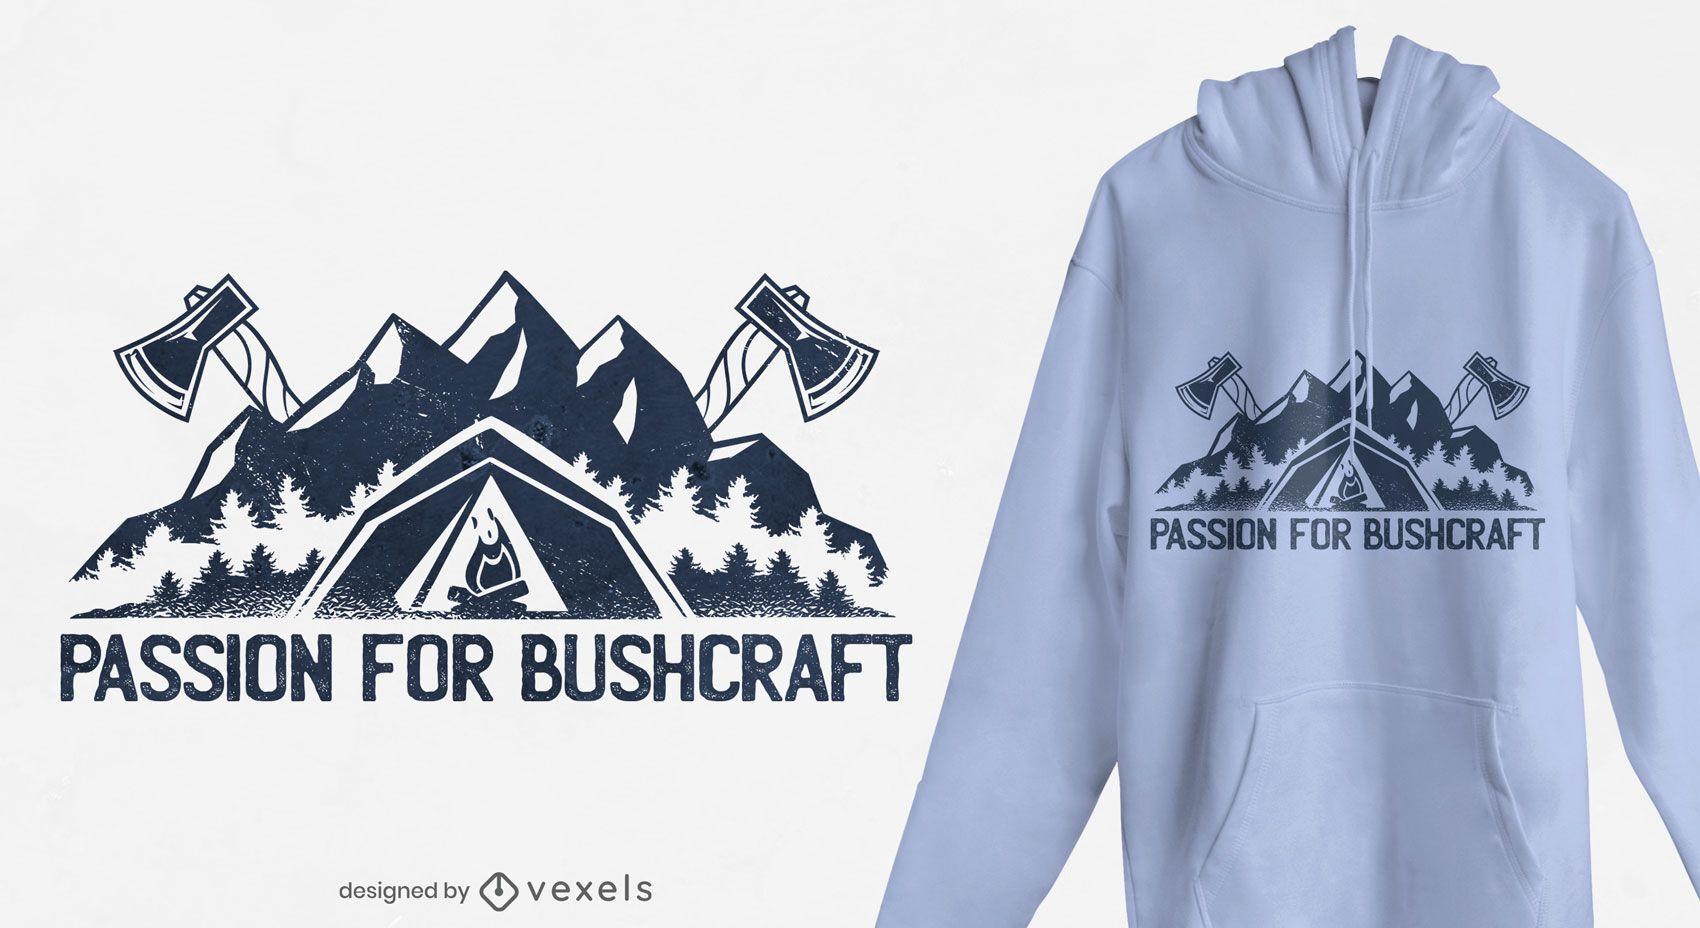 Bushcraft passion t-shirt design